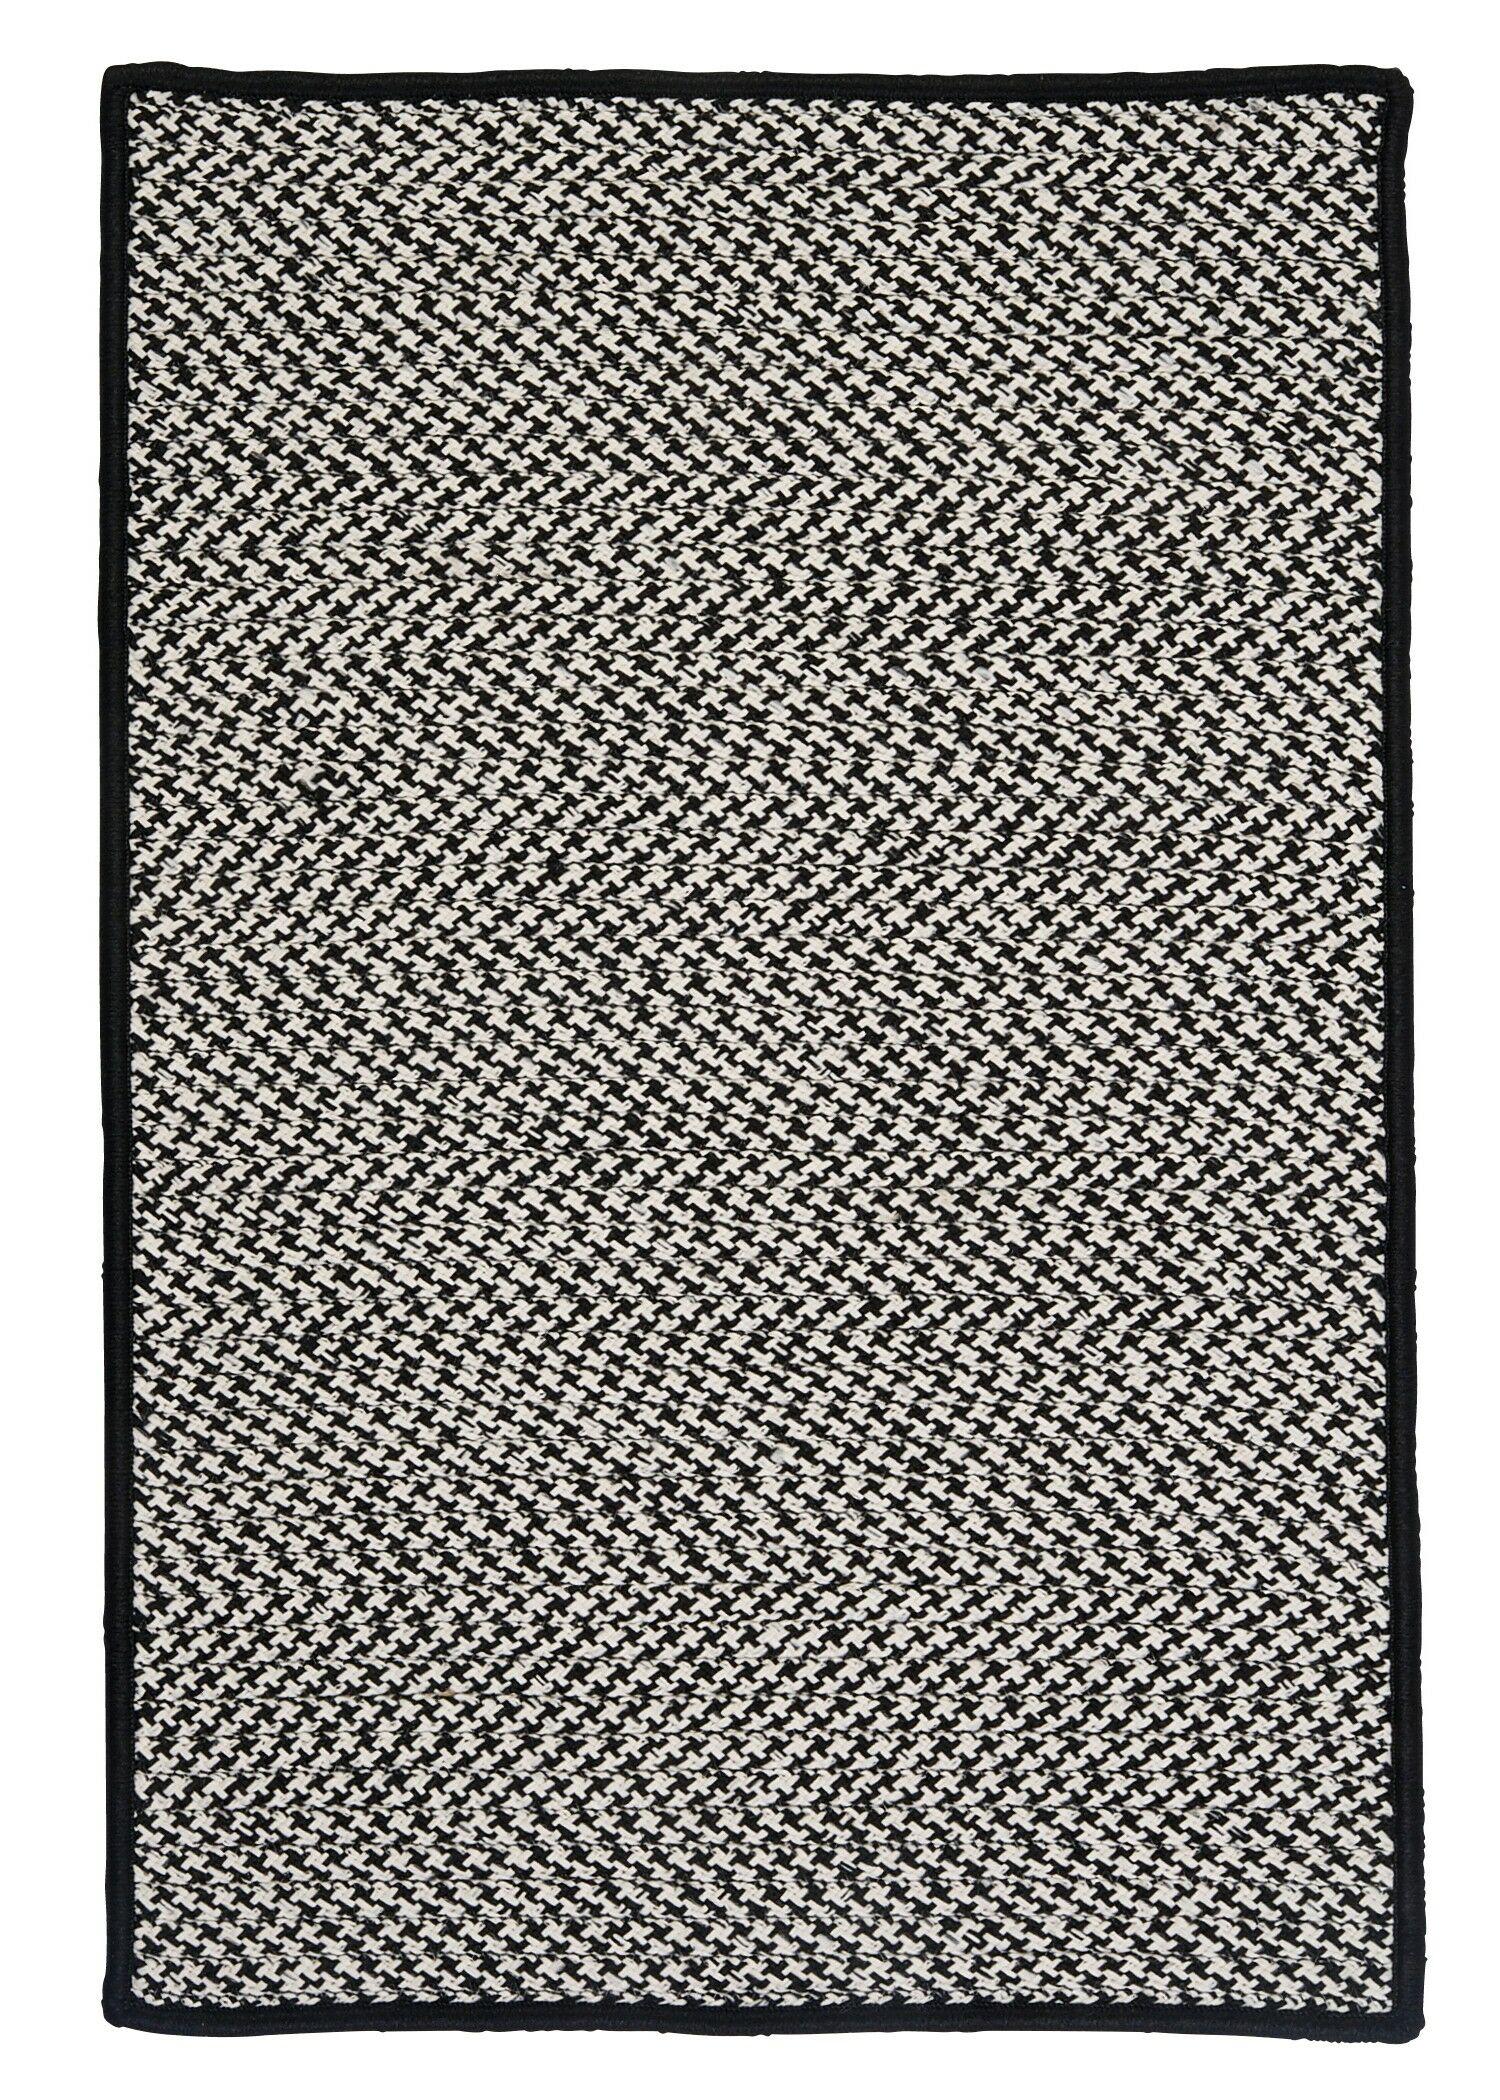 Outdoor Houndstooth Tweed Black Rug Rug Size: Rectangle 3' x 5'